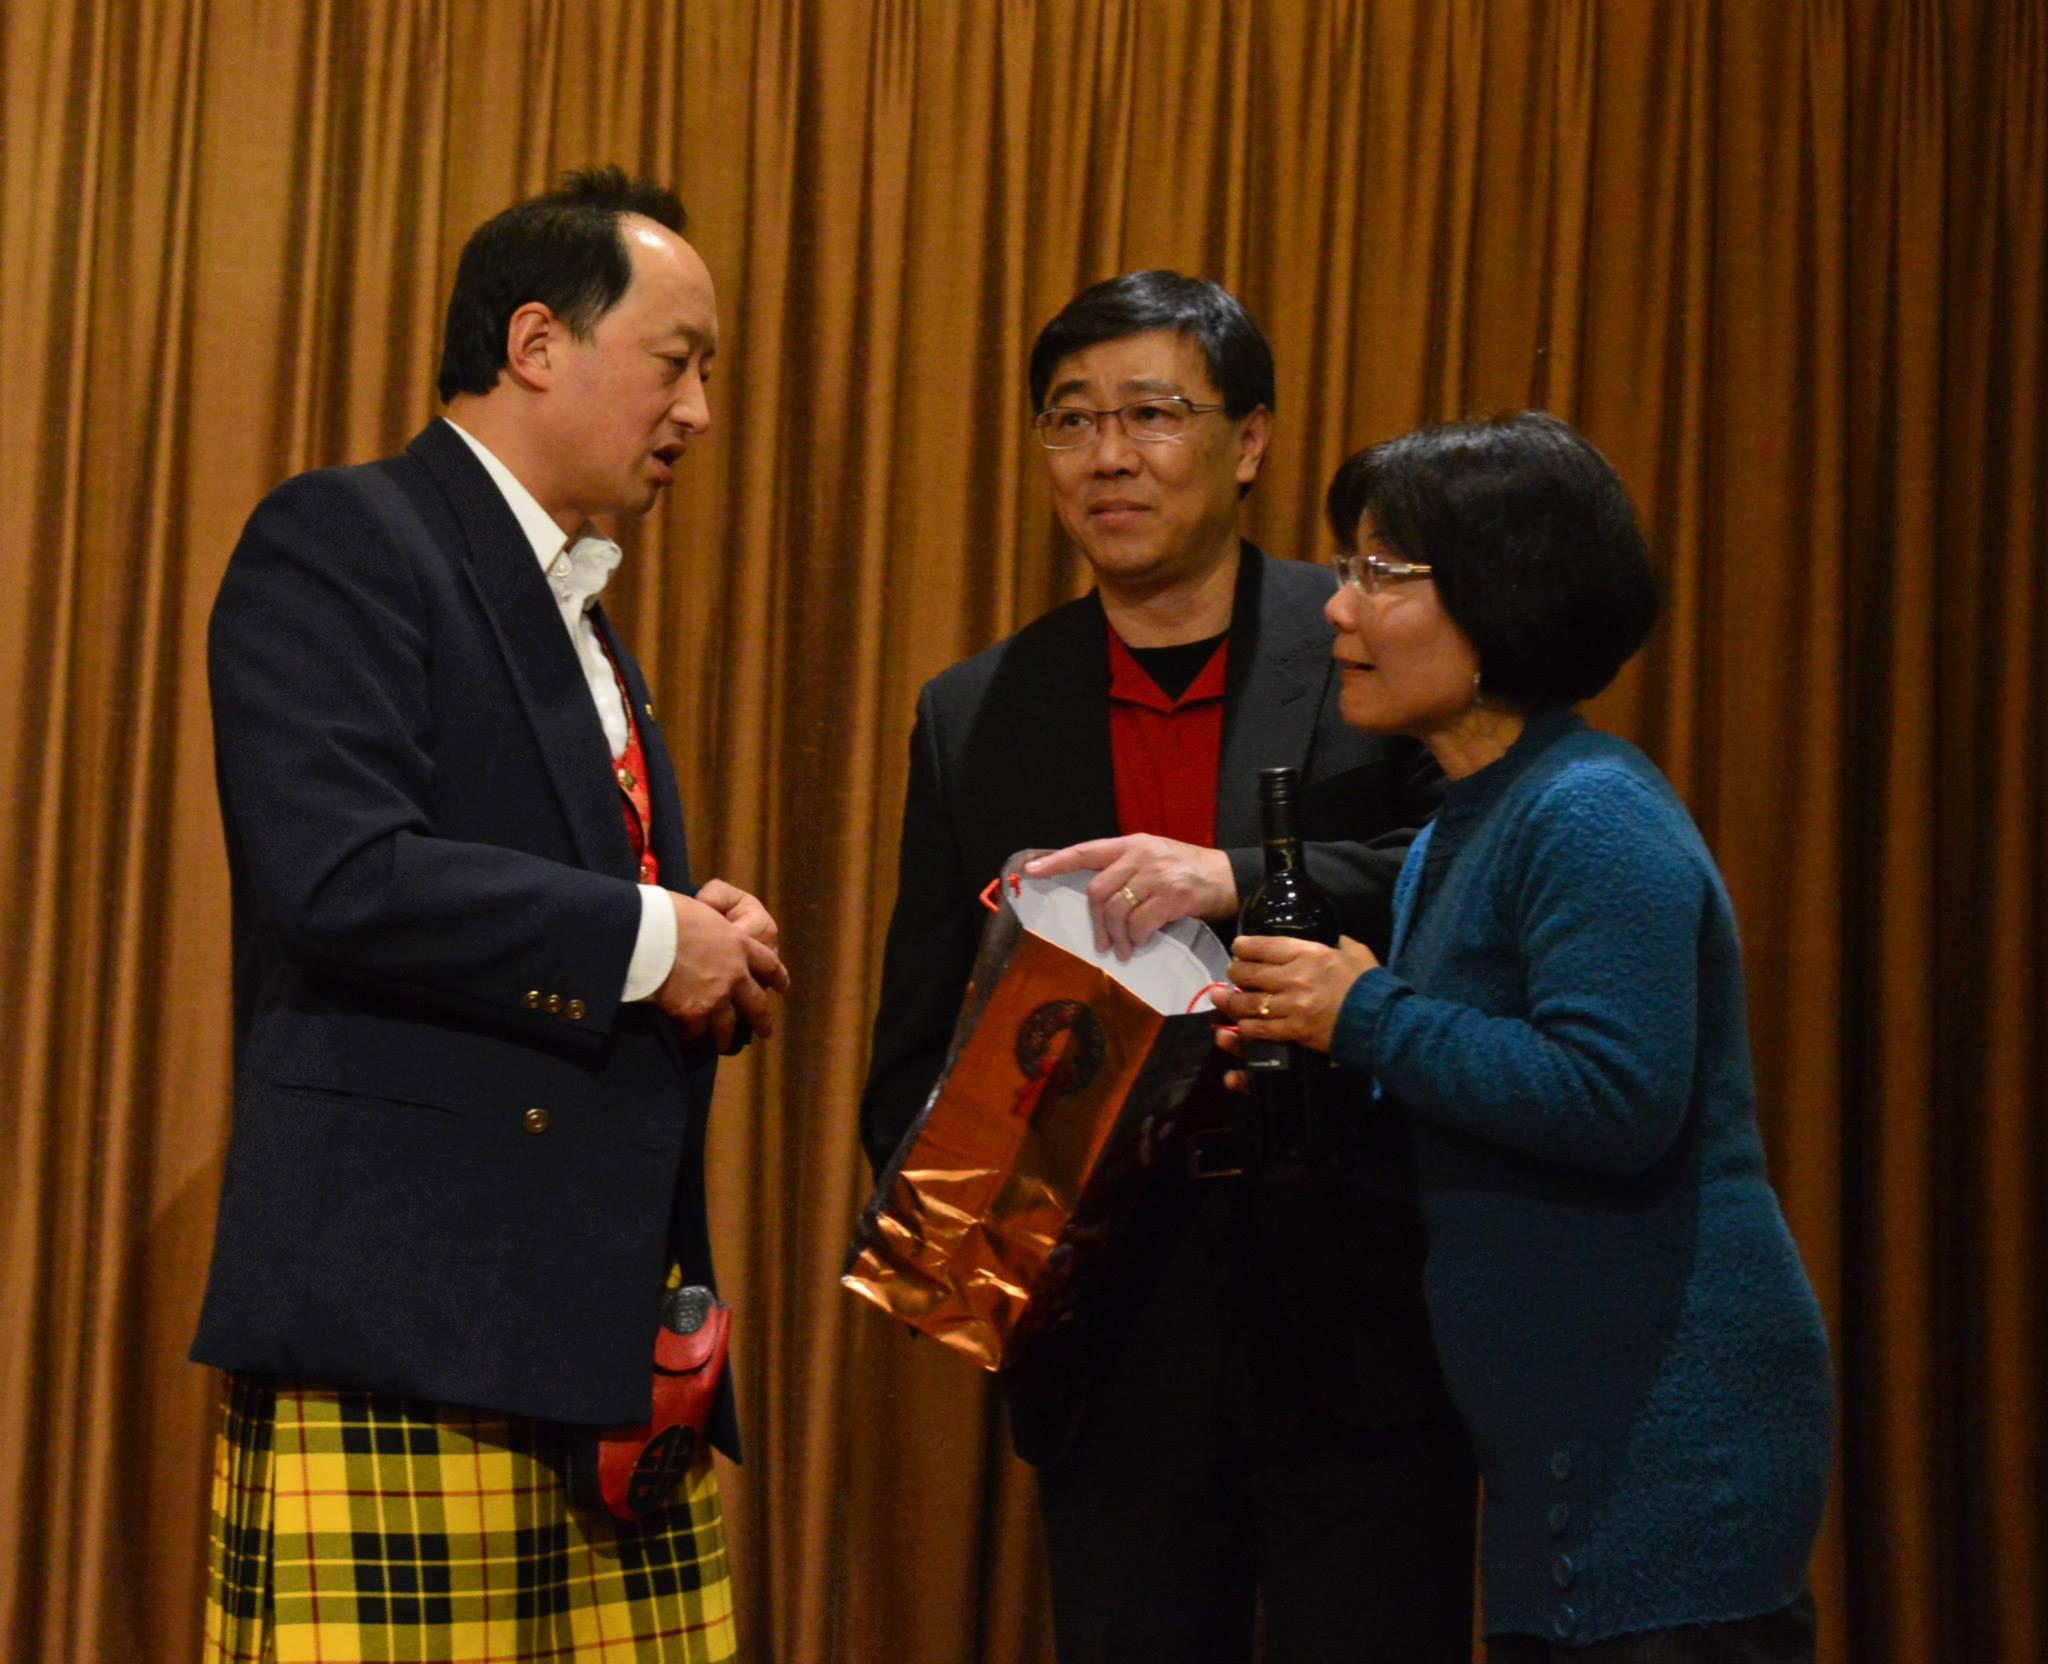 Todd Wong, Winnie Cheung, and David HT Wong